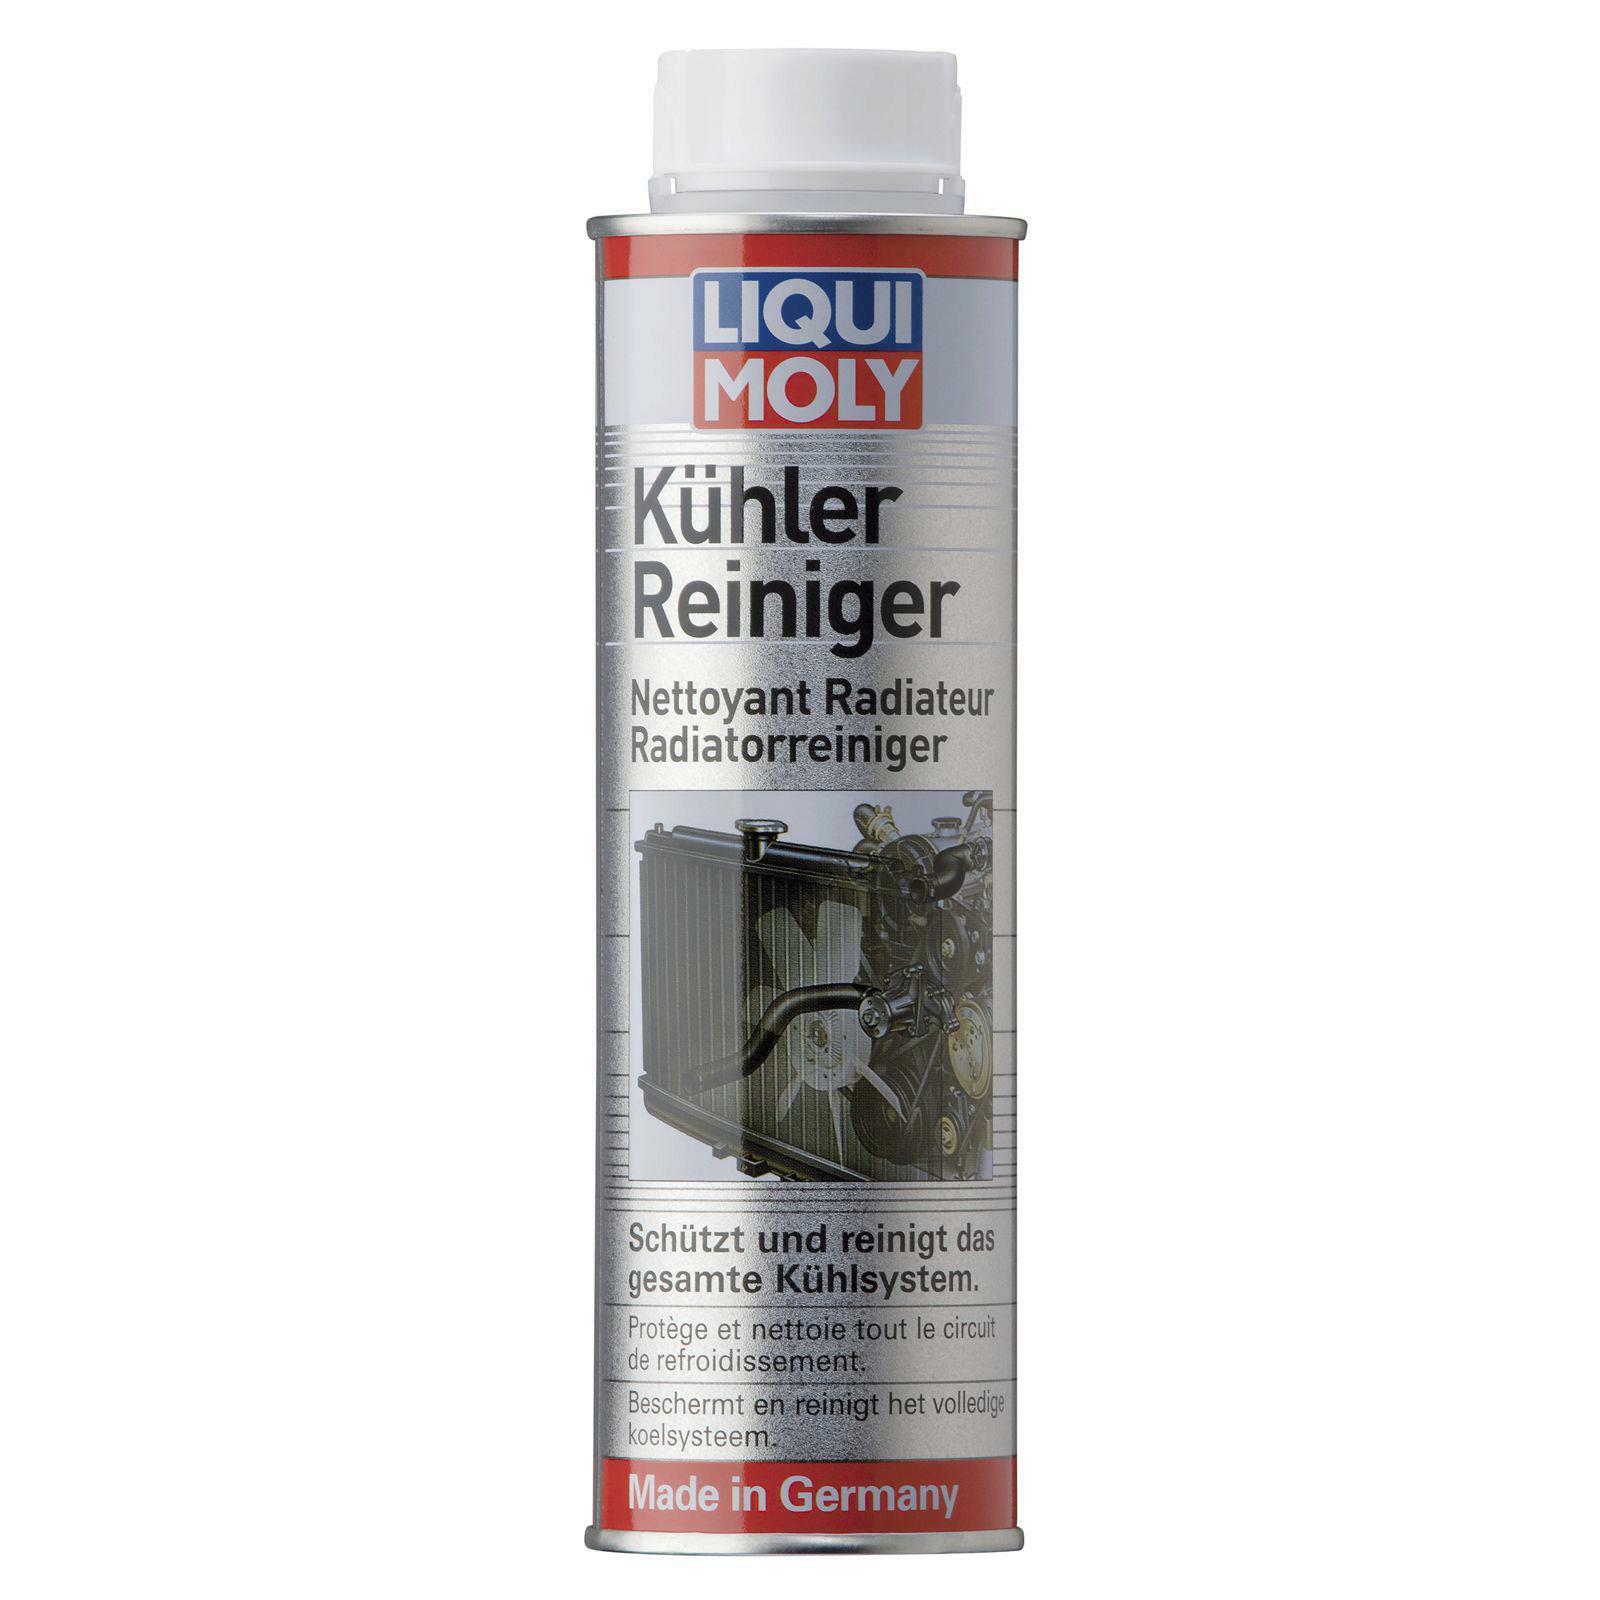 Liqui Moly Kühler-Reiniger 300ml